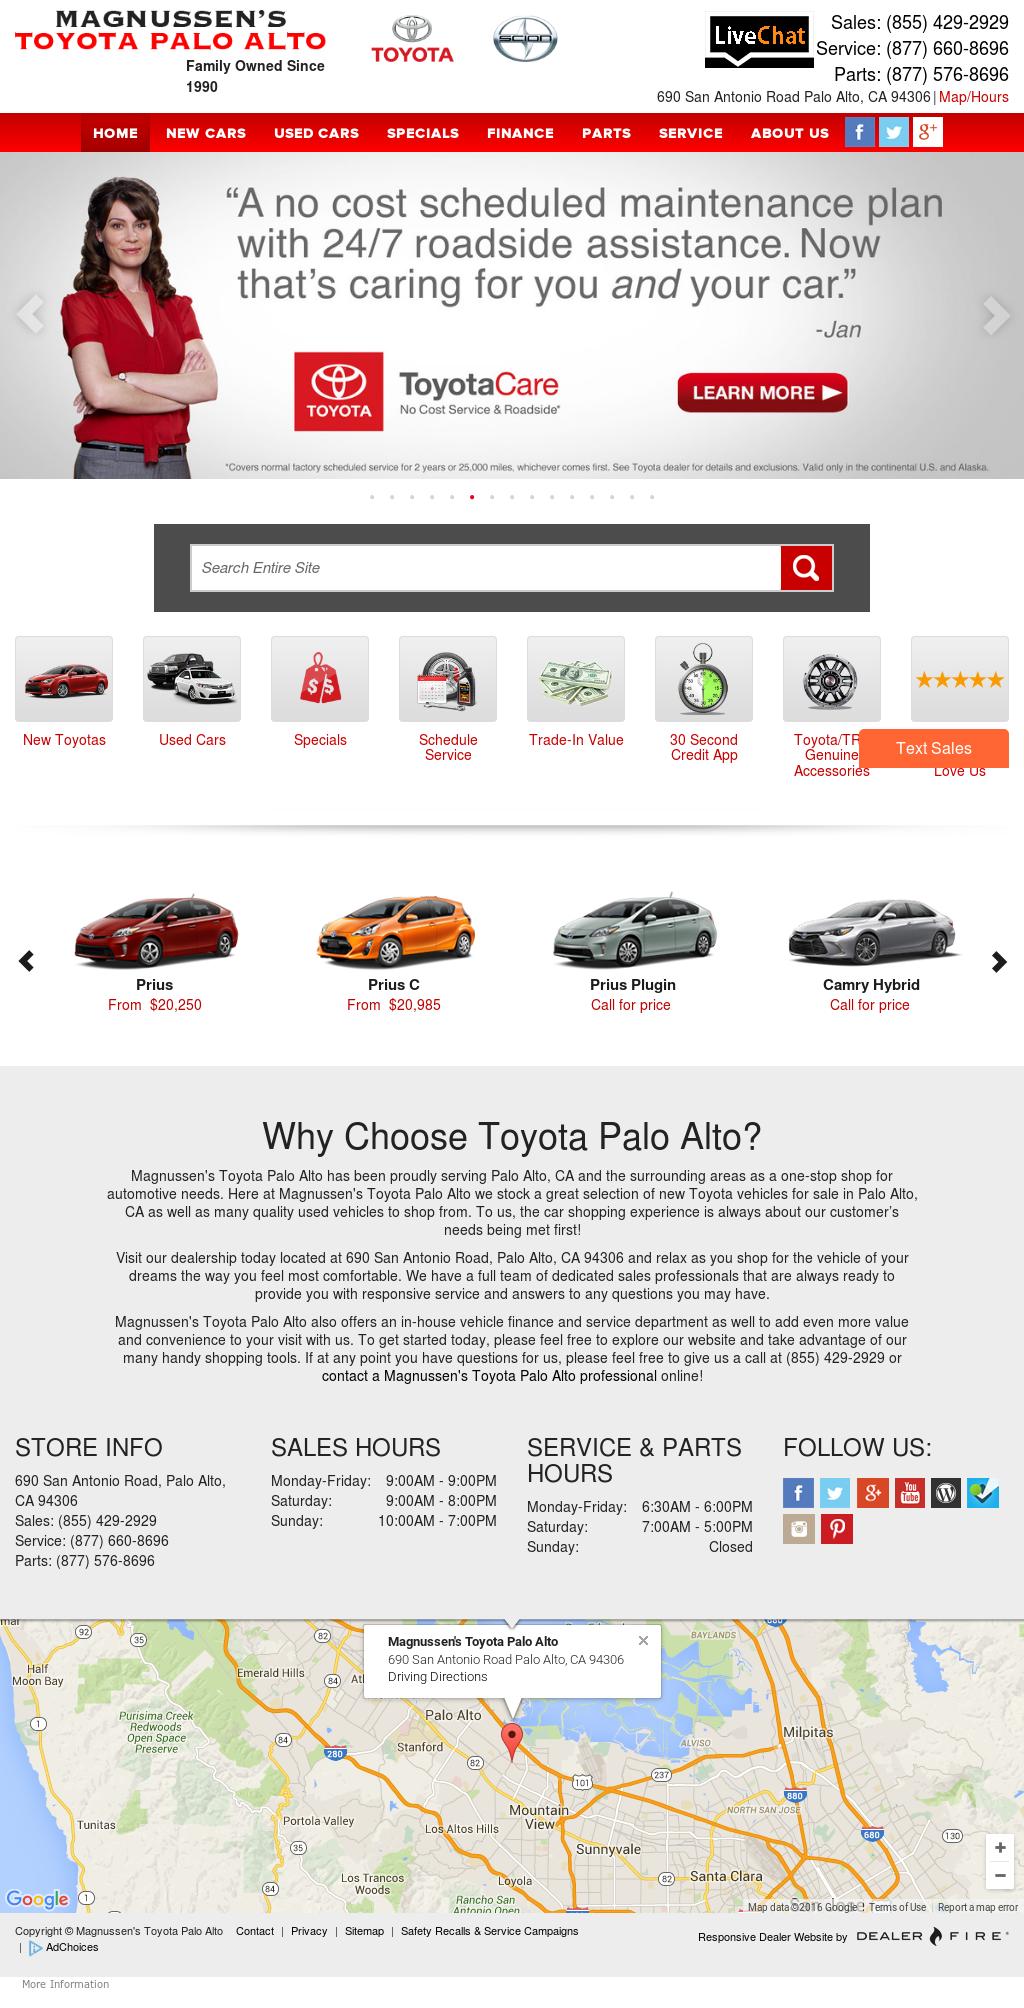 Toyota Of Palo Alto Competitors, Revenue And Employees   Owler Company  Profile